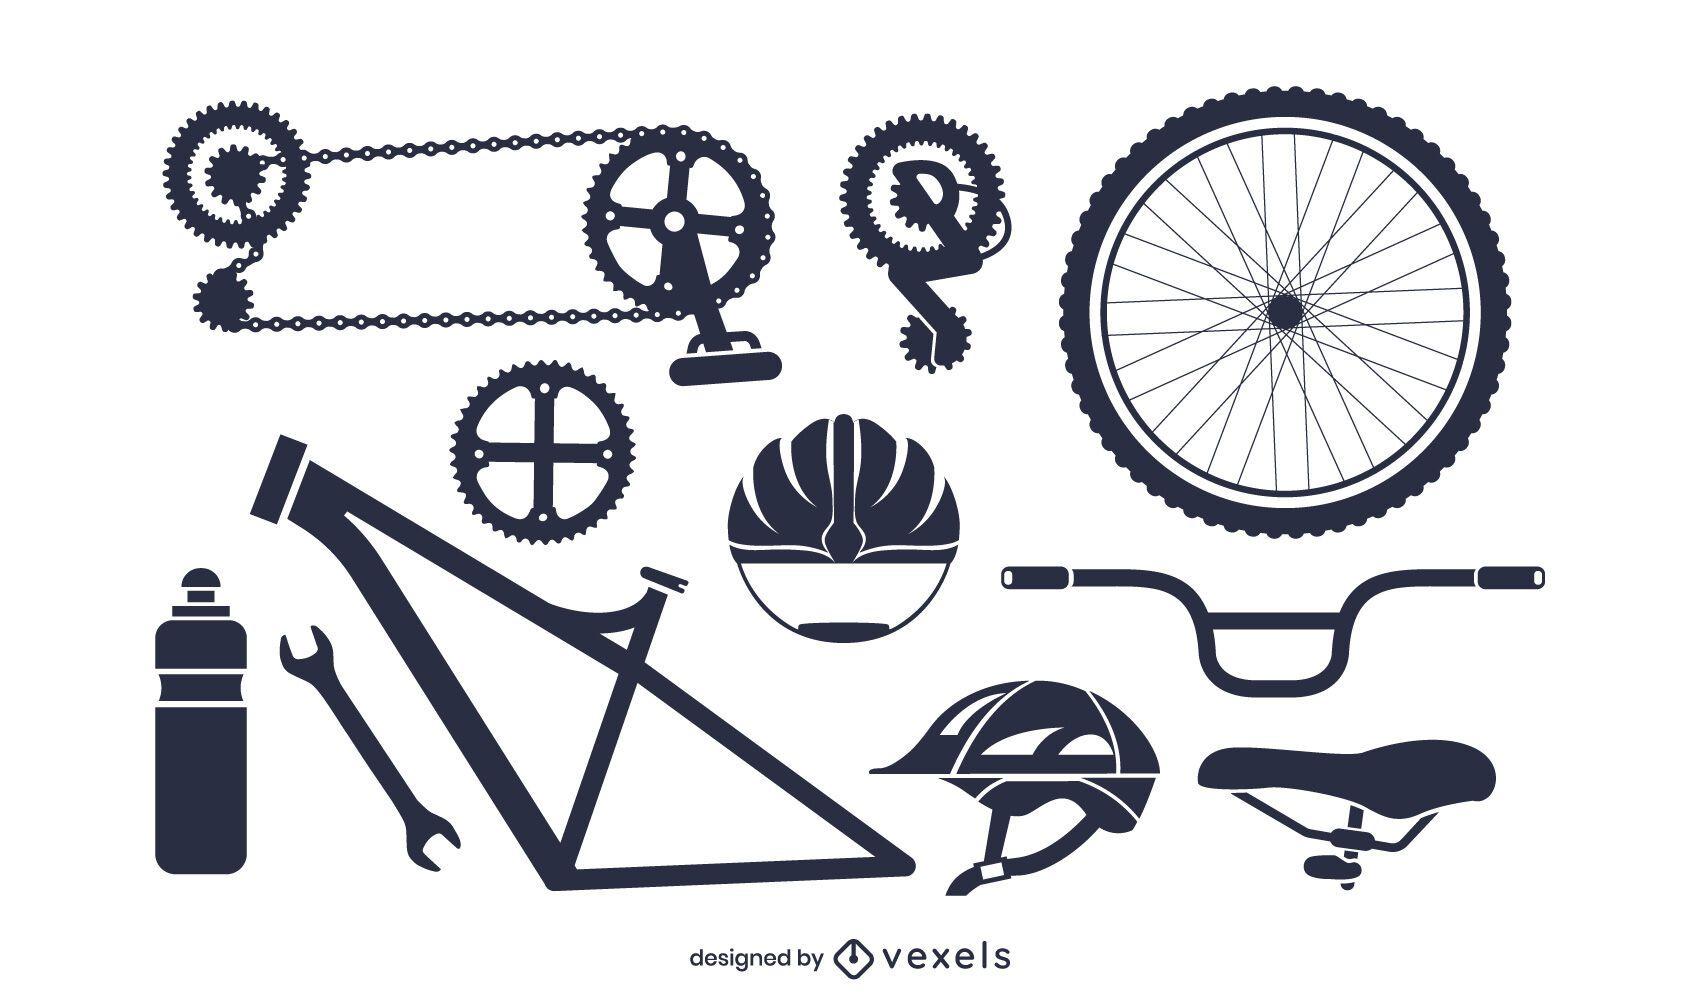 Paquete de silueta de piezas de bicicleta